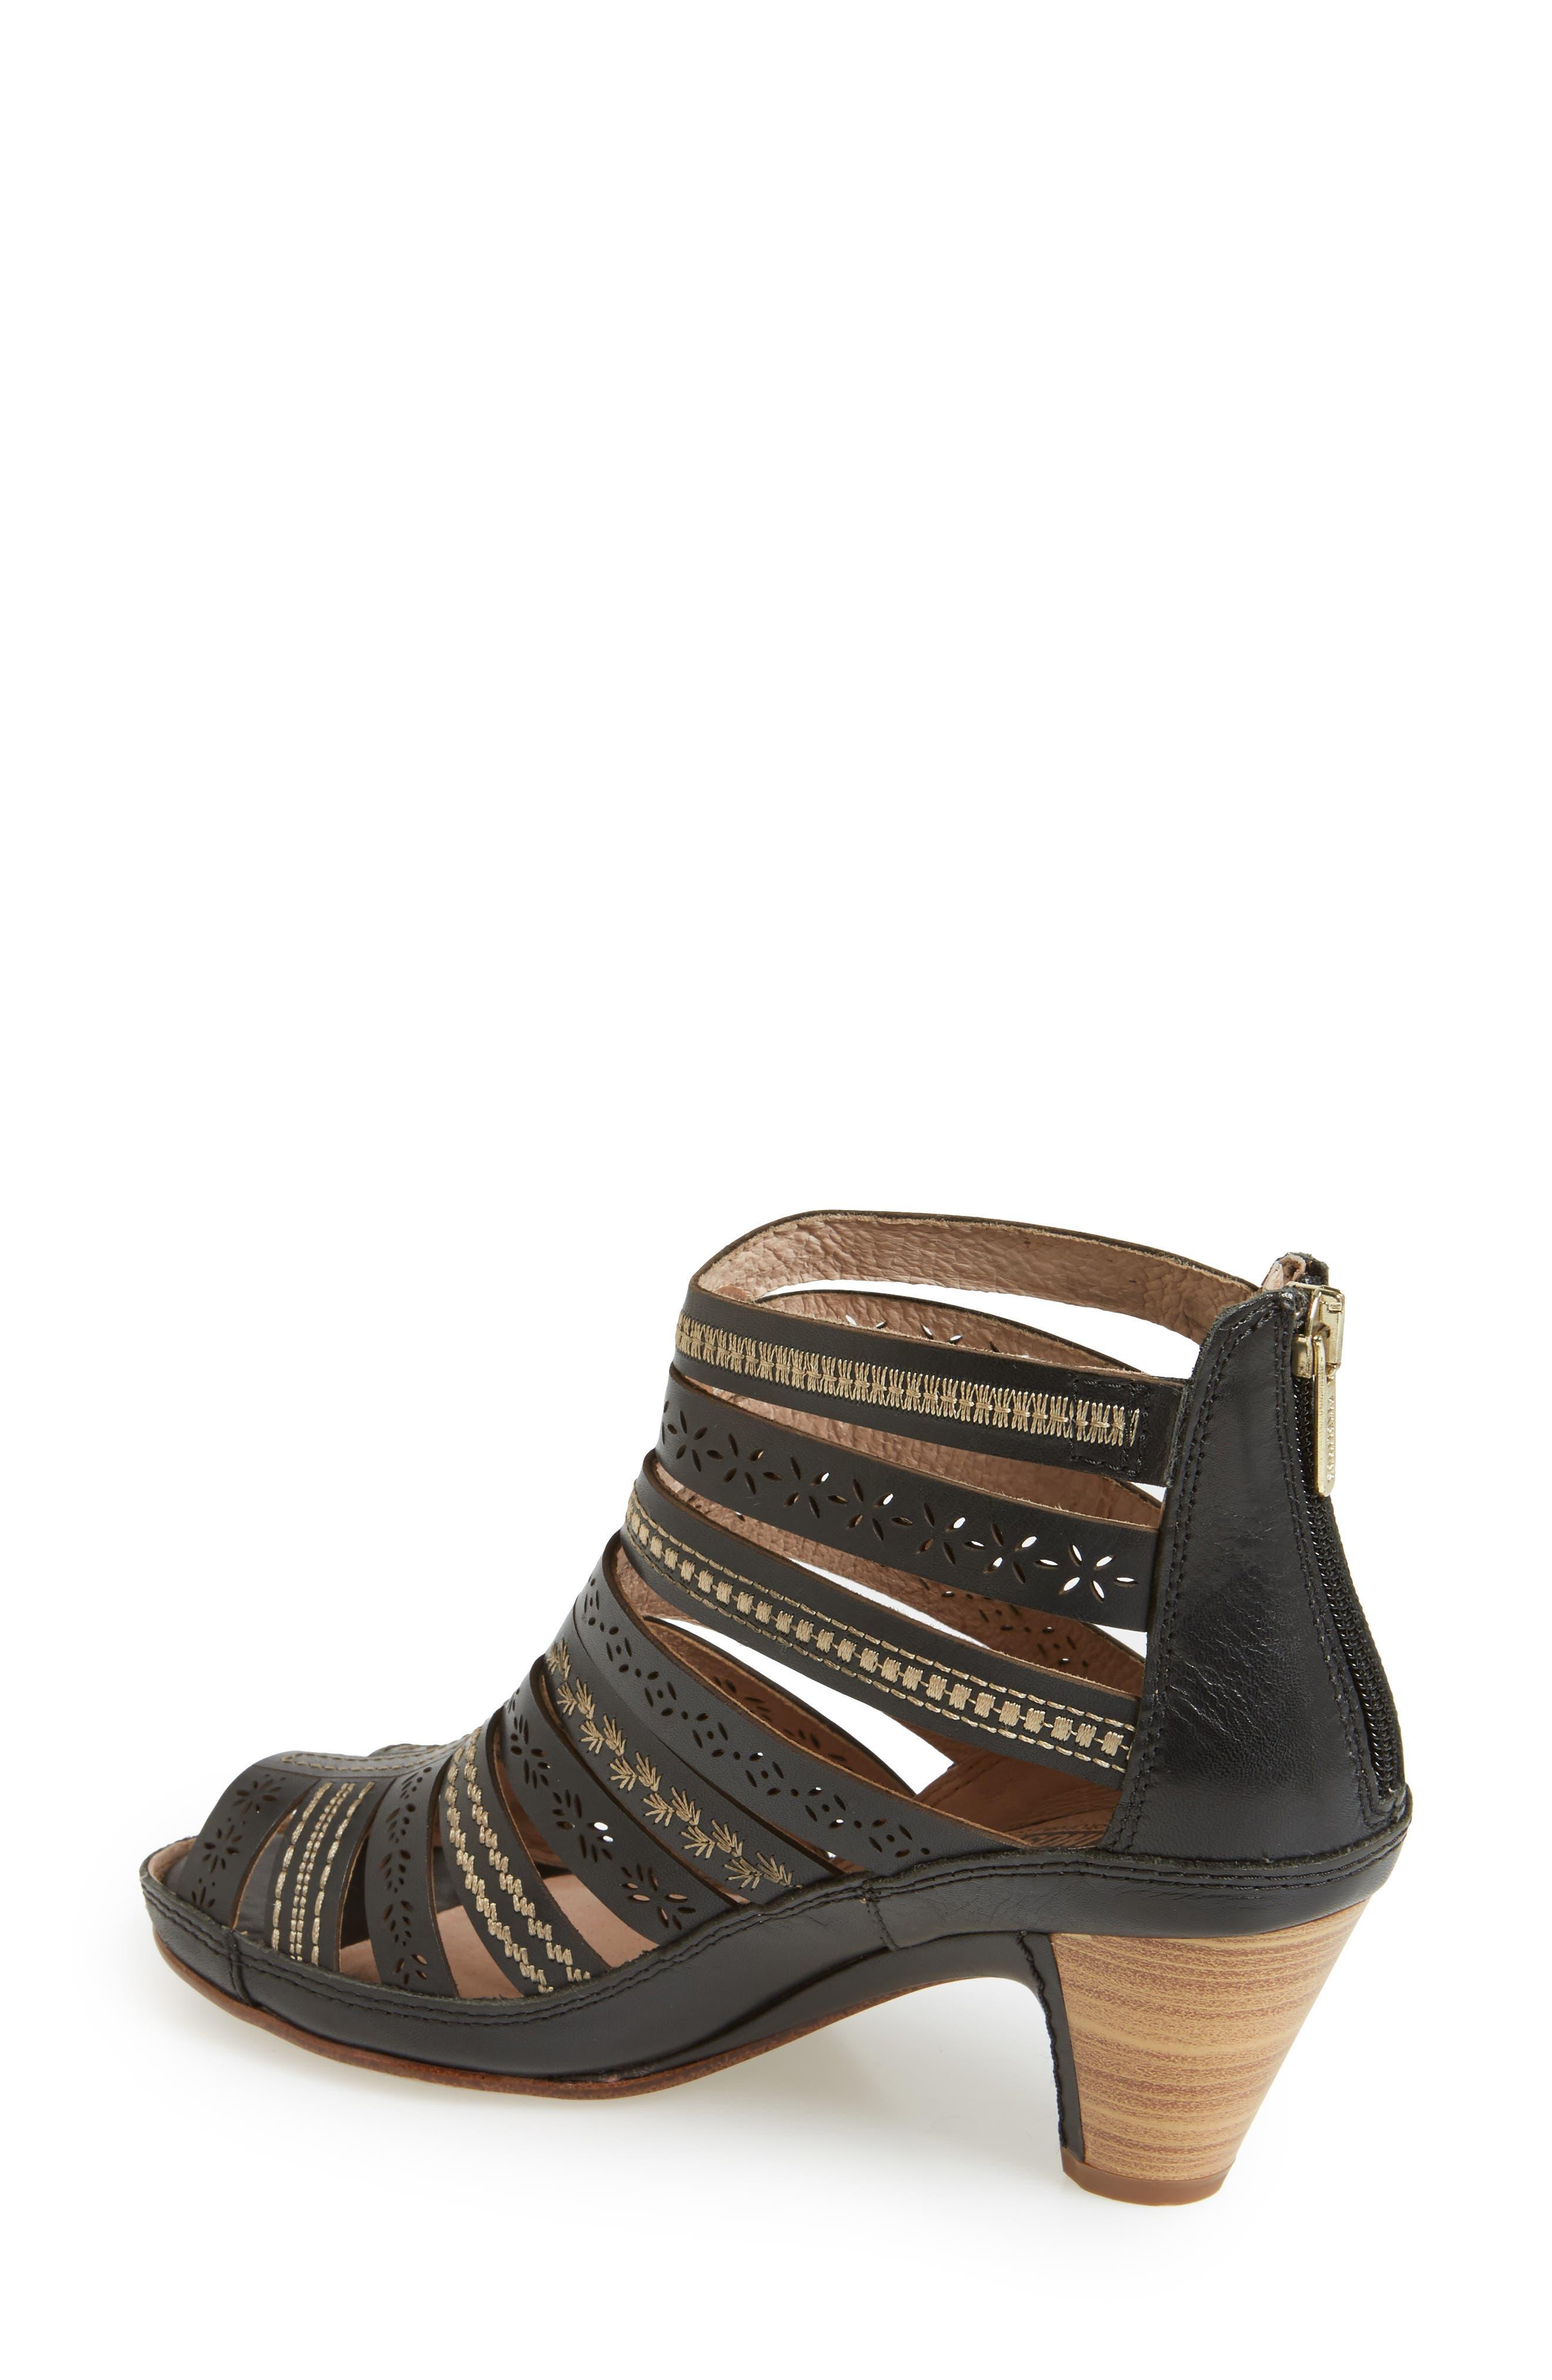 Alternate Image 2  - PIKOLINOS 'Java' Leather Gladiator Sandal (Women)